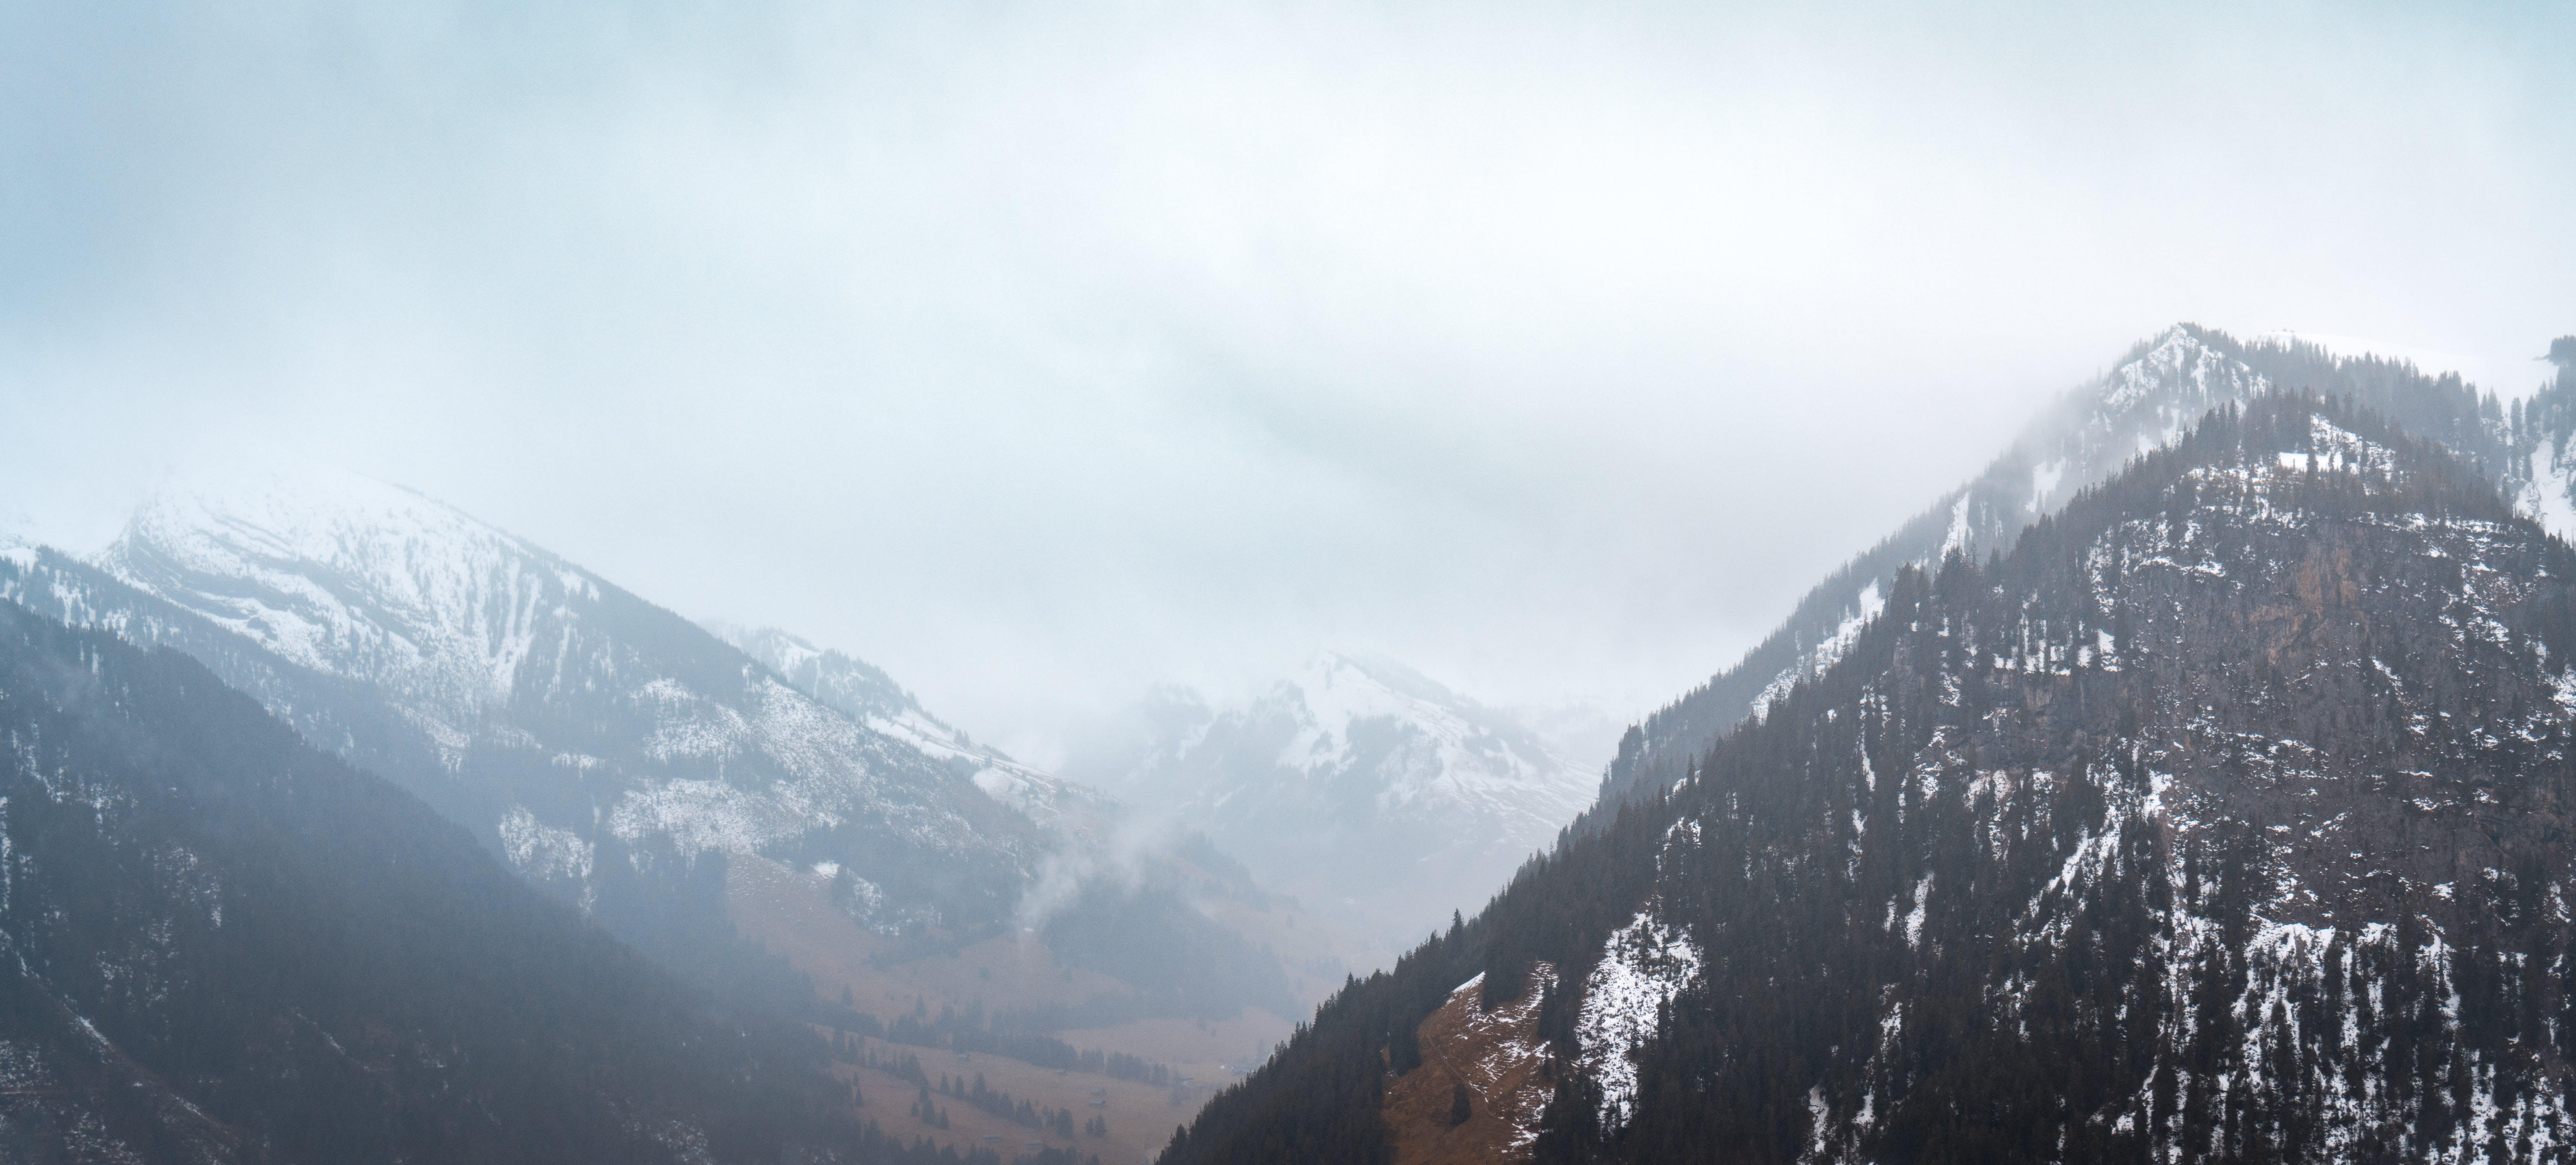 Free stock photo of foggy, landscape, misty, moody